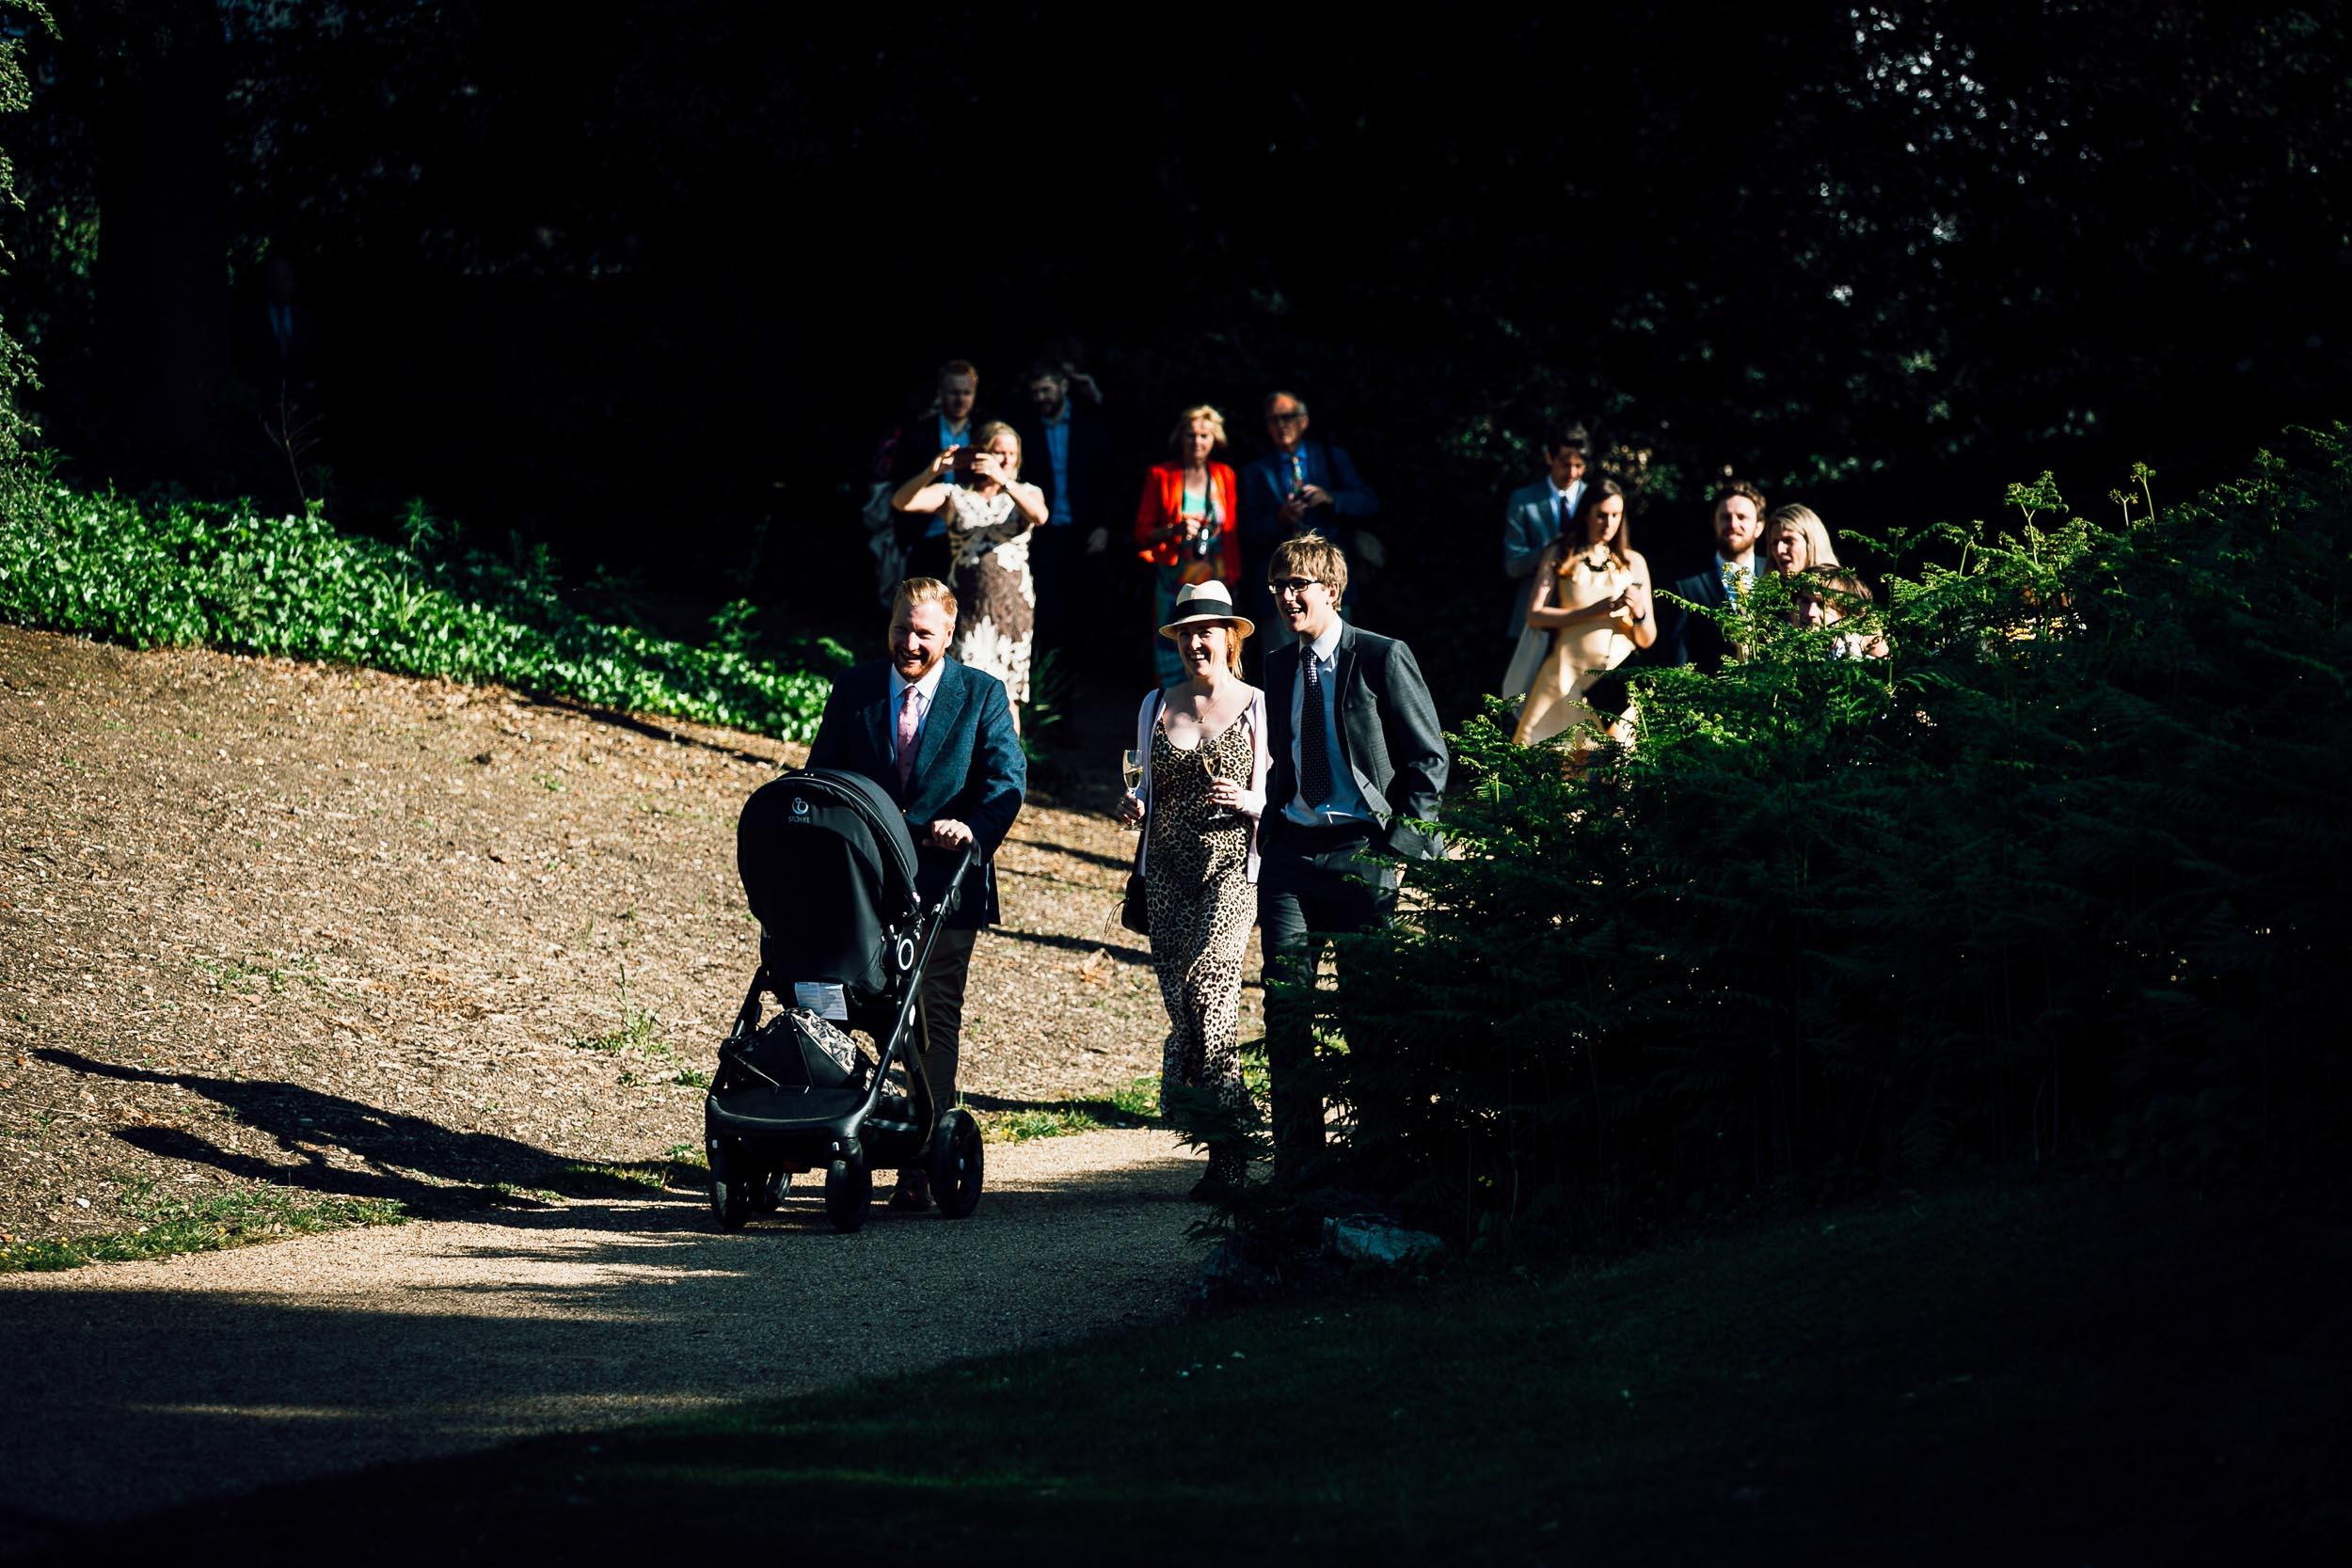 syon-house-wedding-photographer-london 108.jpg